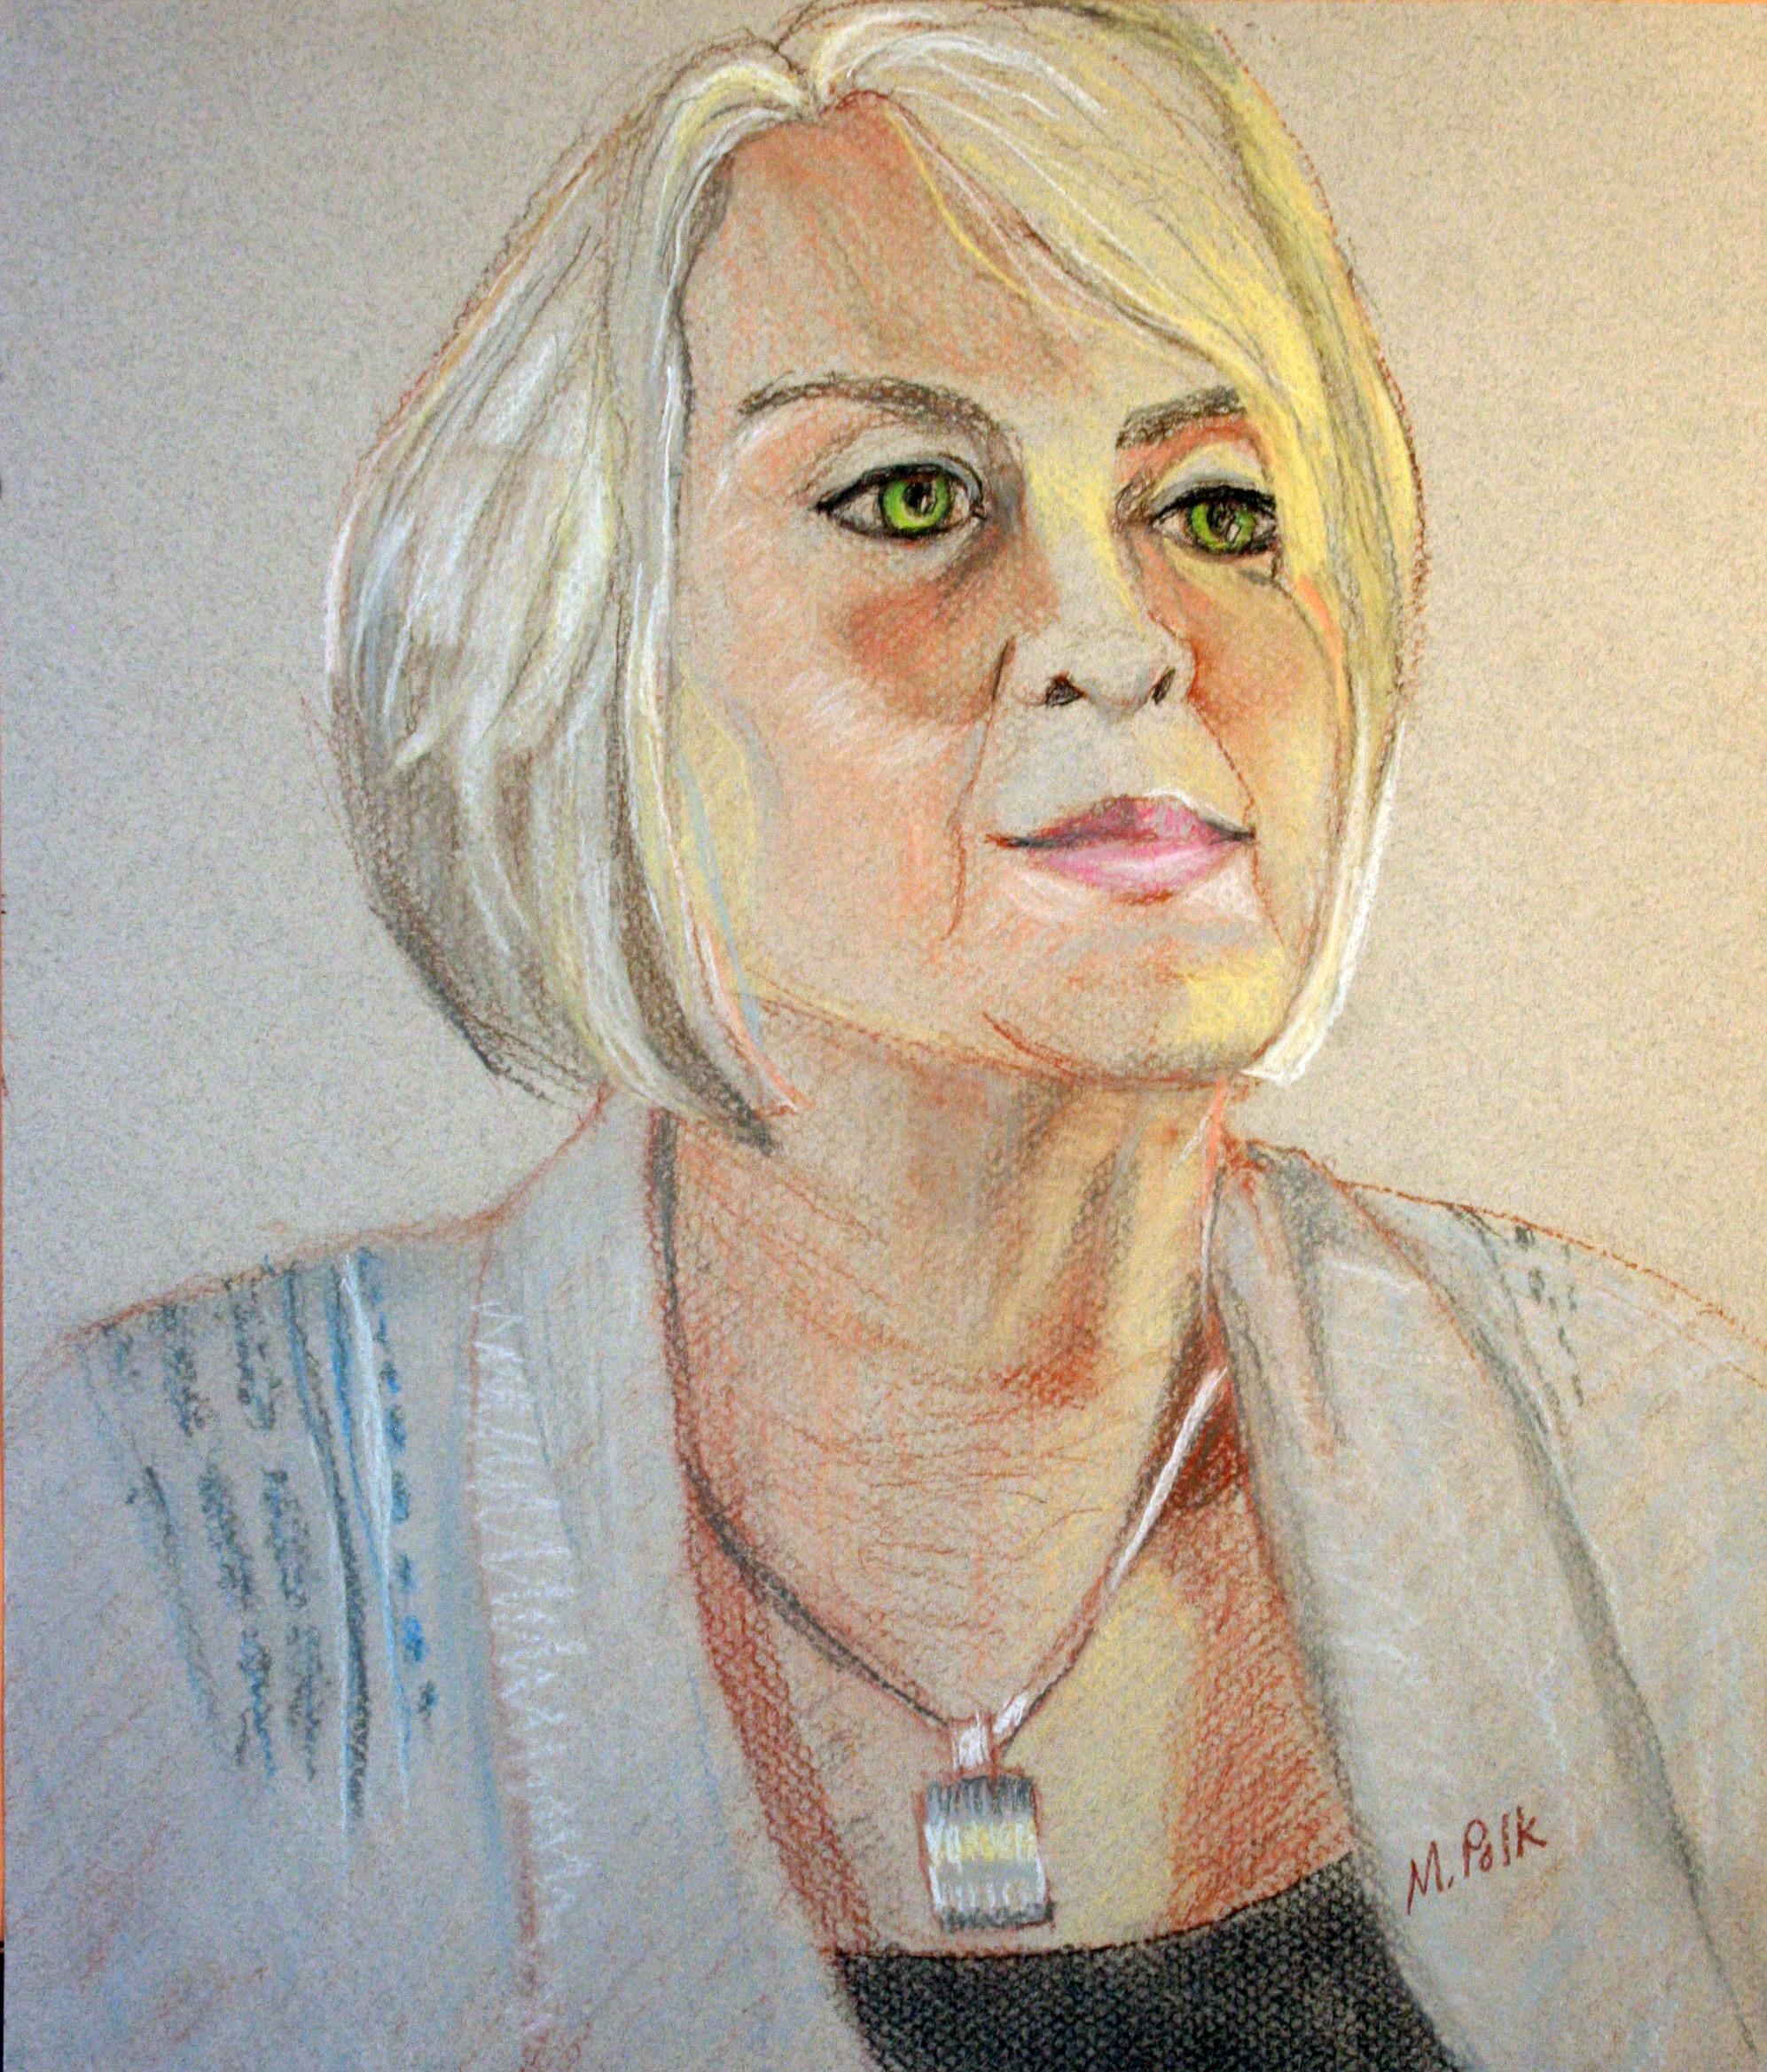 Maria Polk did this pastel drawing.